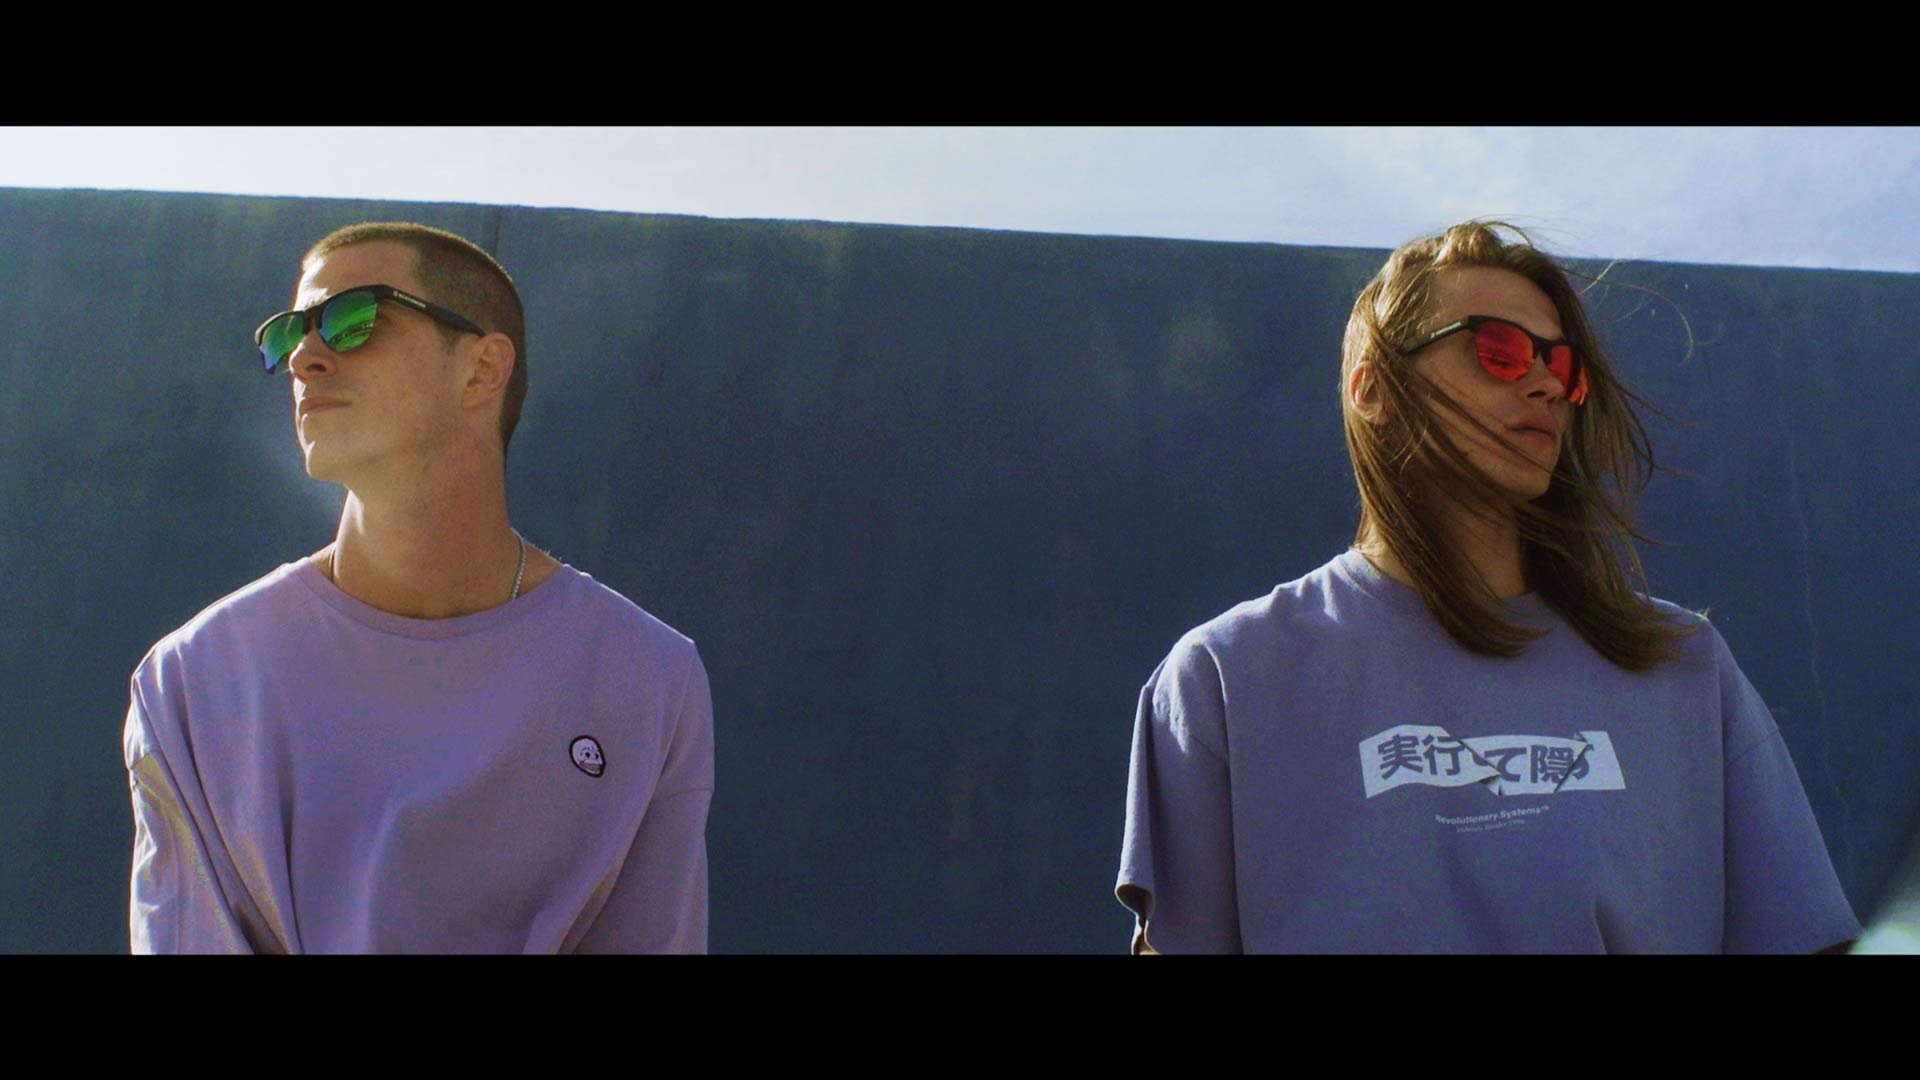 Northweek Sunglasses Barcelona skate hidestudio produccion spot fashionfilm